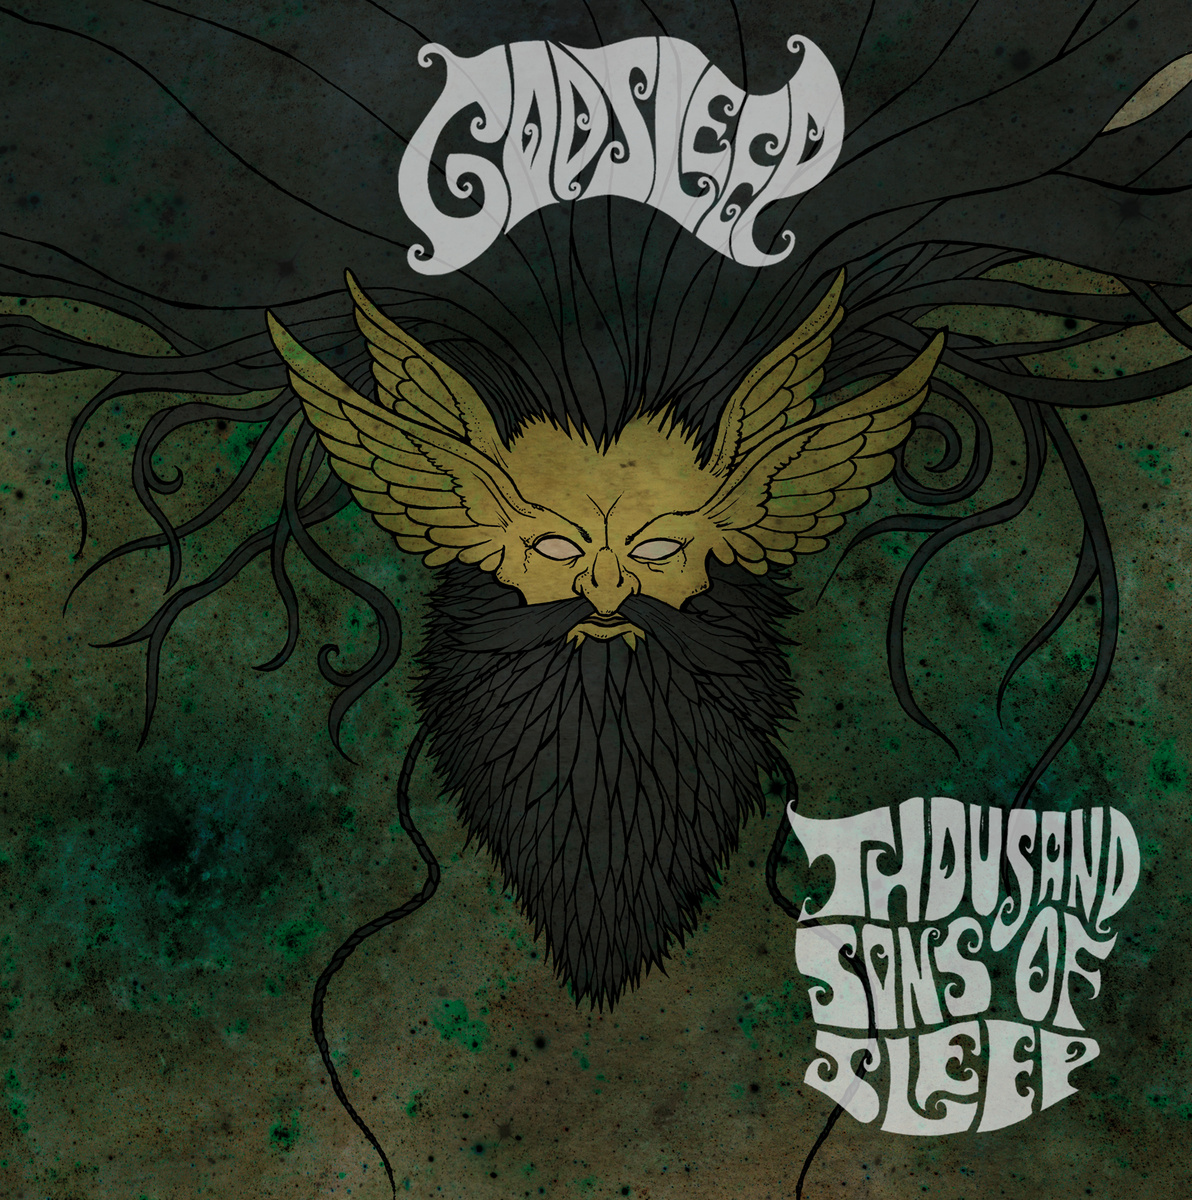 godsleep thousand sons of sleep